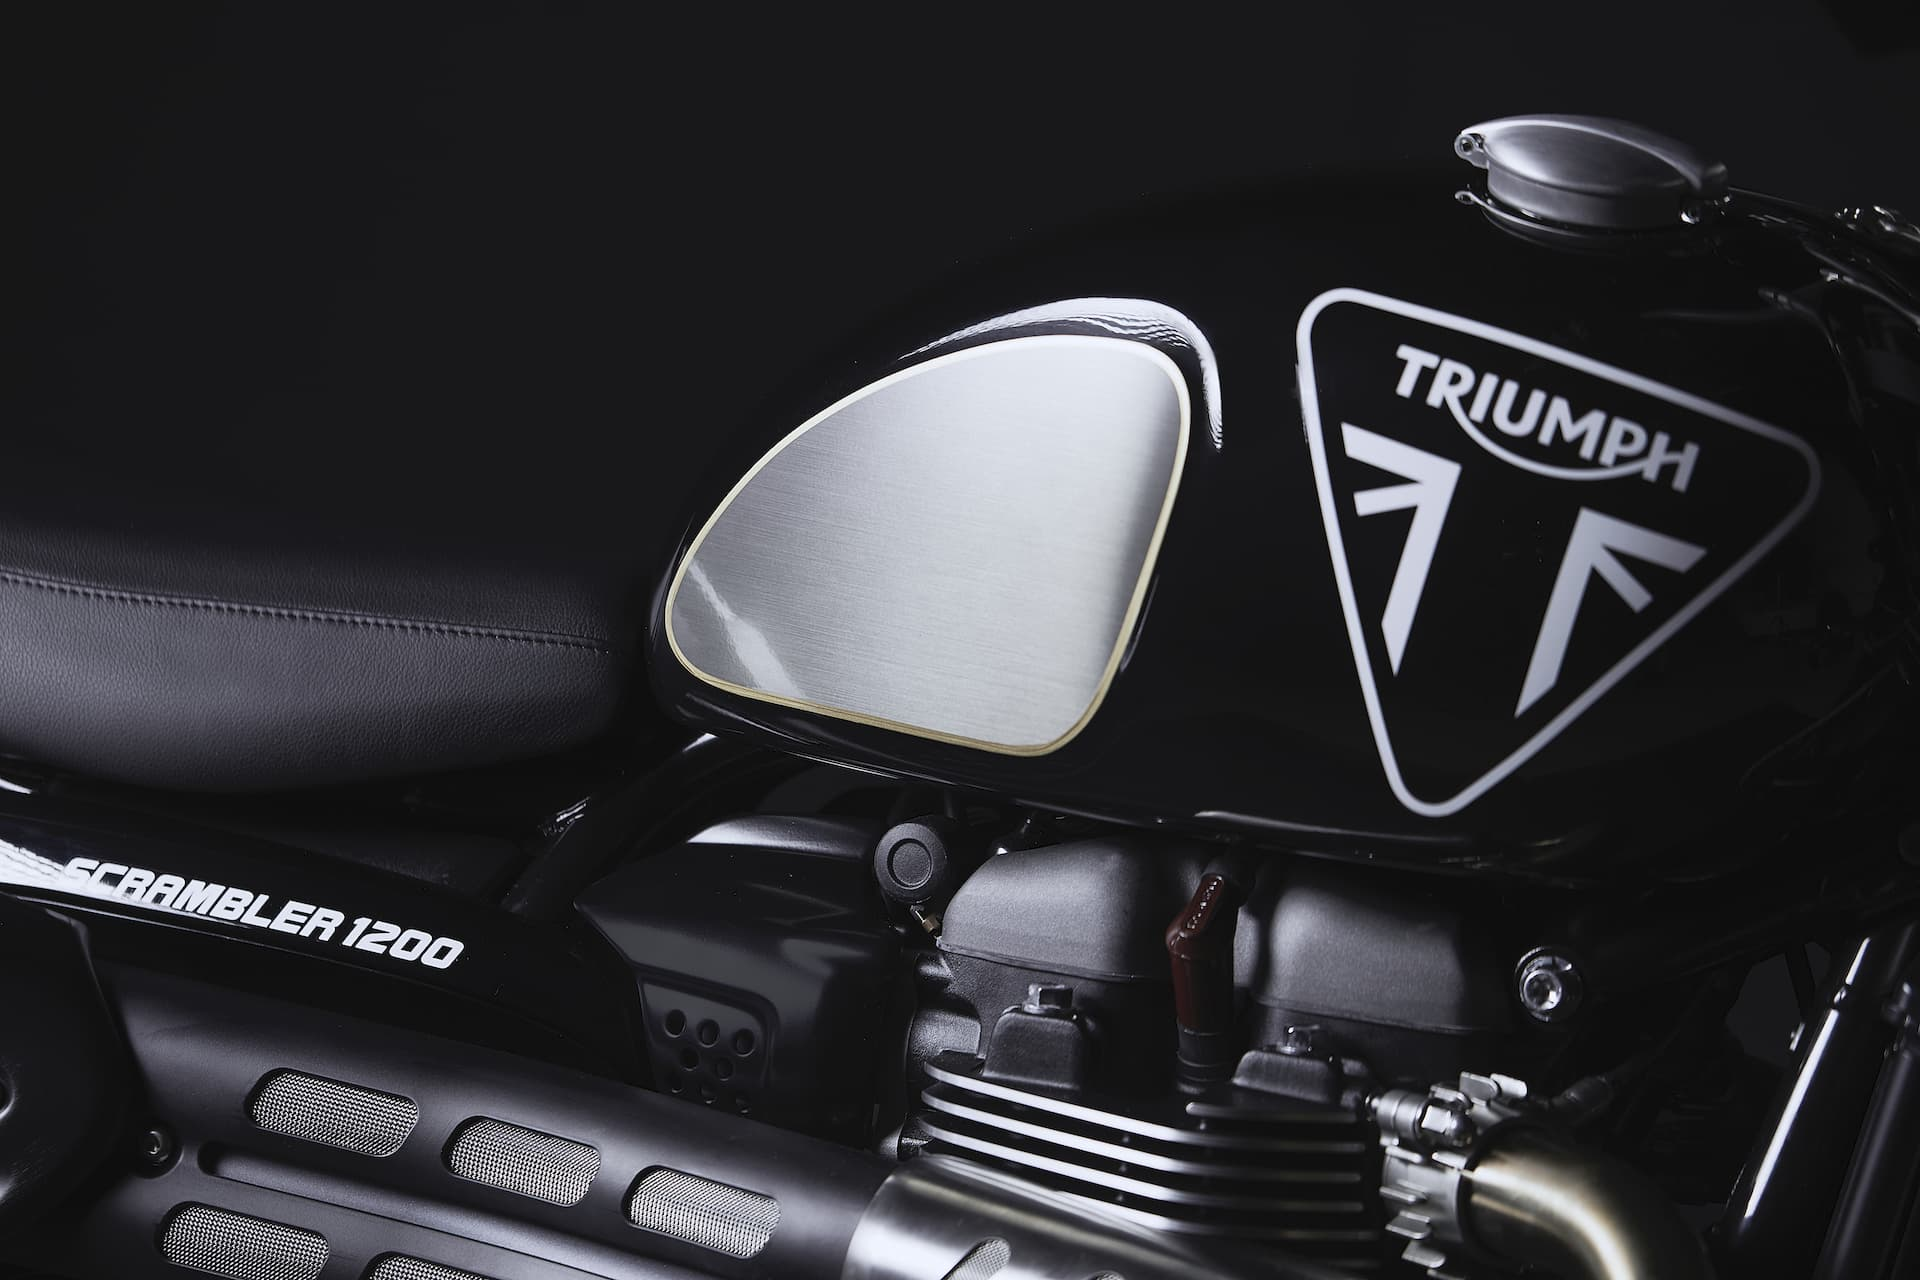 Triumphxnttd Scrambler1200 20200443